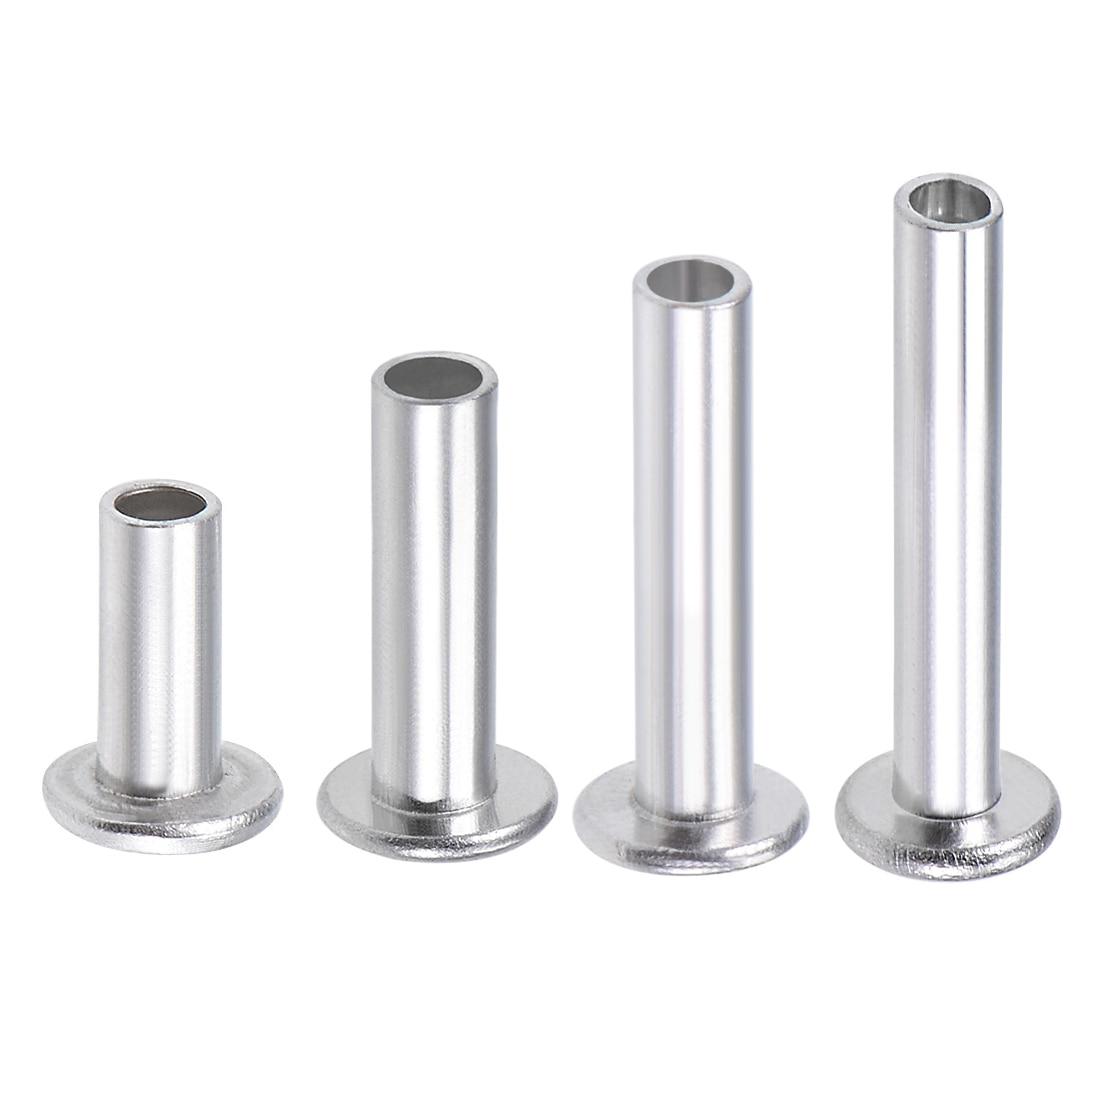 100Pcs 4mm x 18mm Aluminum Flat Head Semi-Tubular Rivets Silver Tone